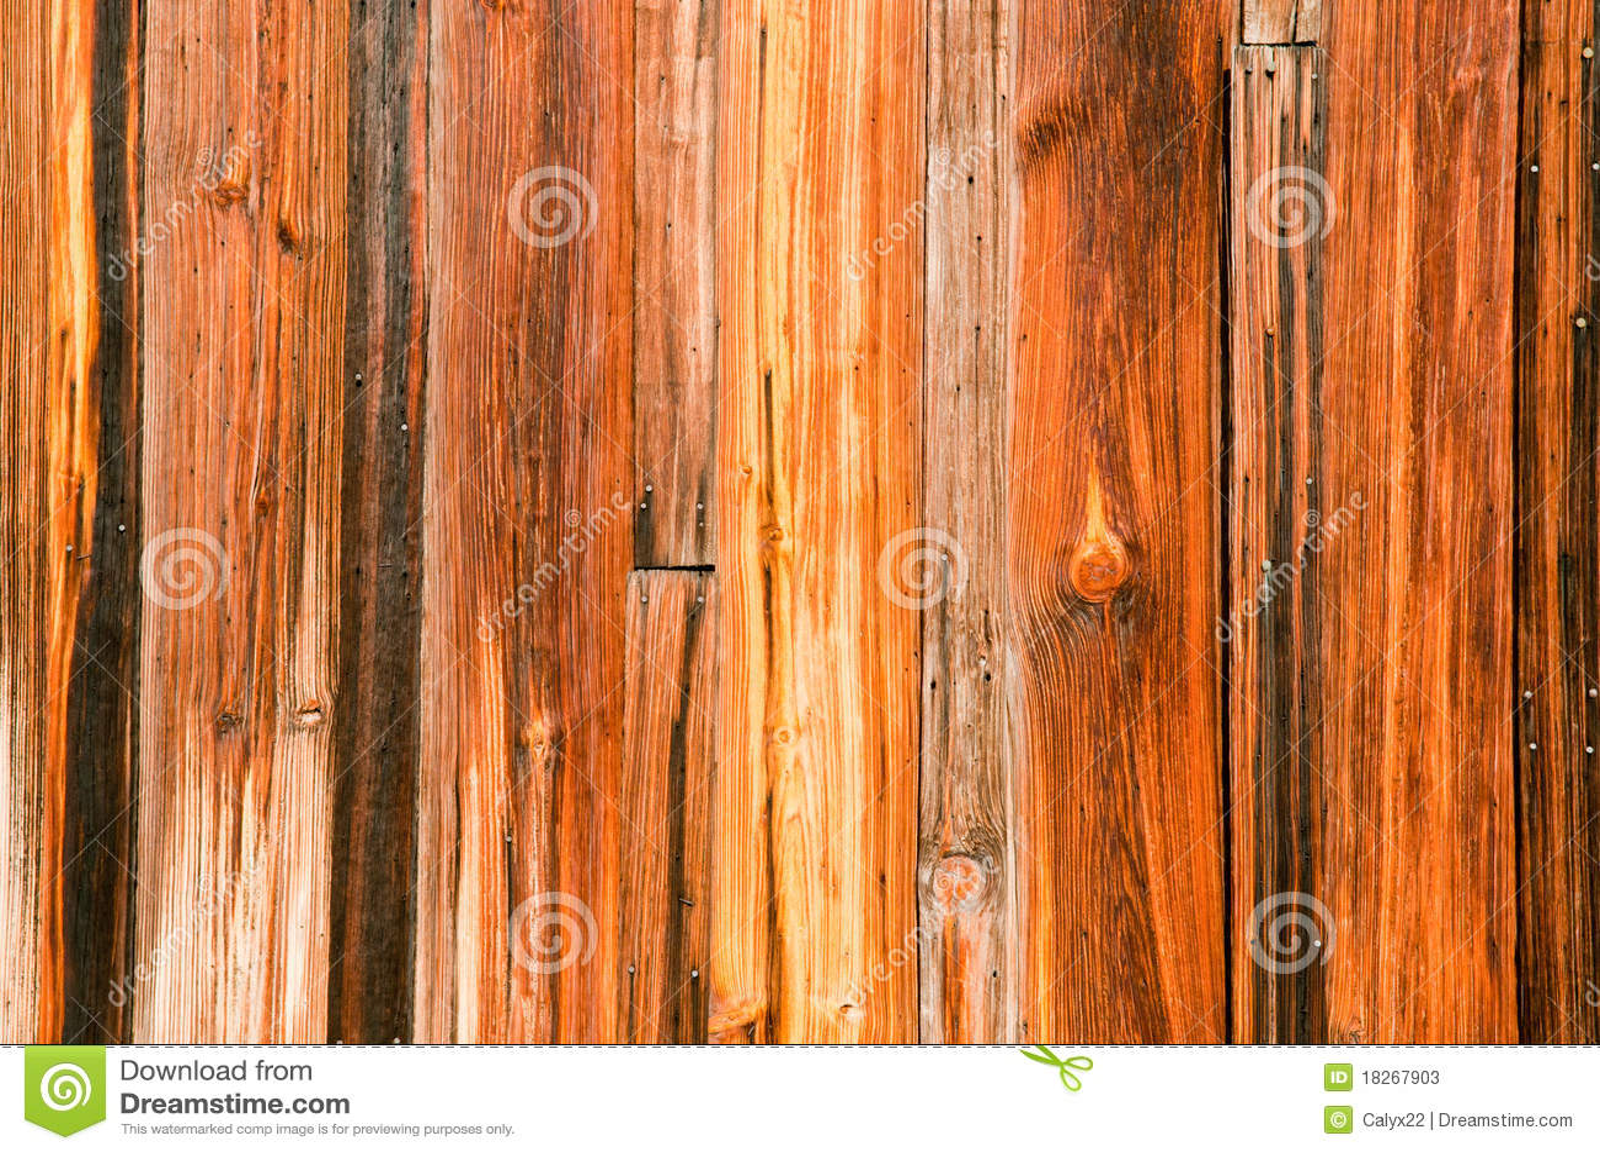 Old cedar wood planks stock photos image